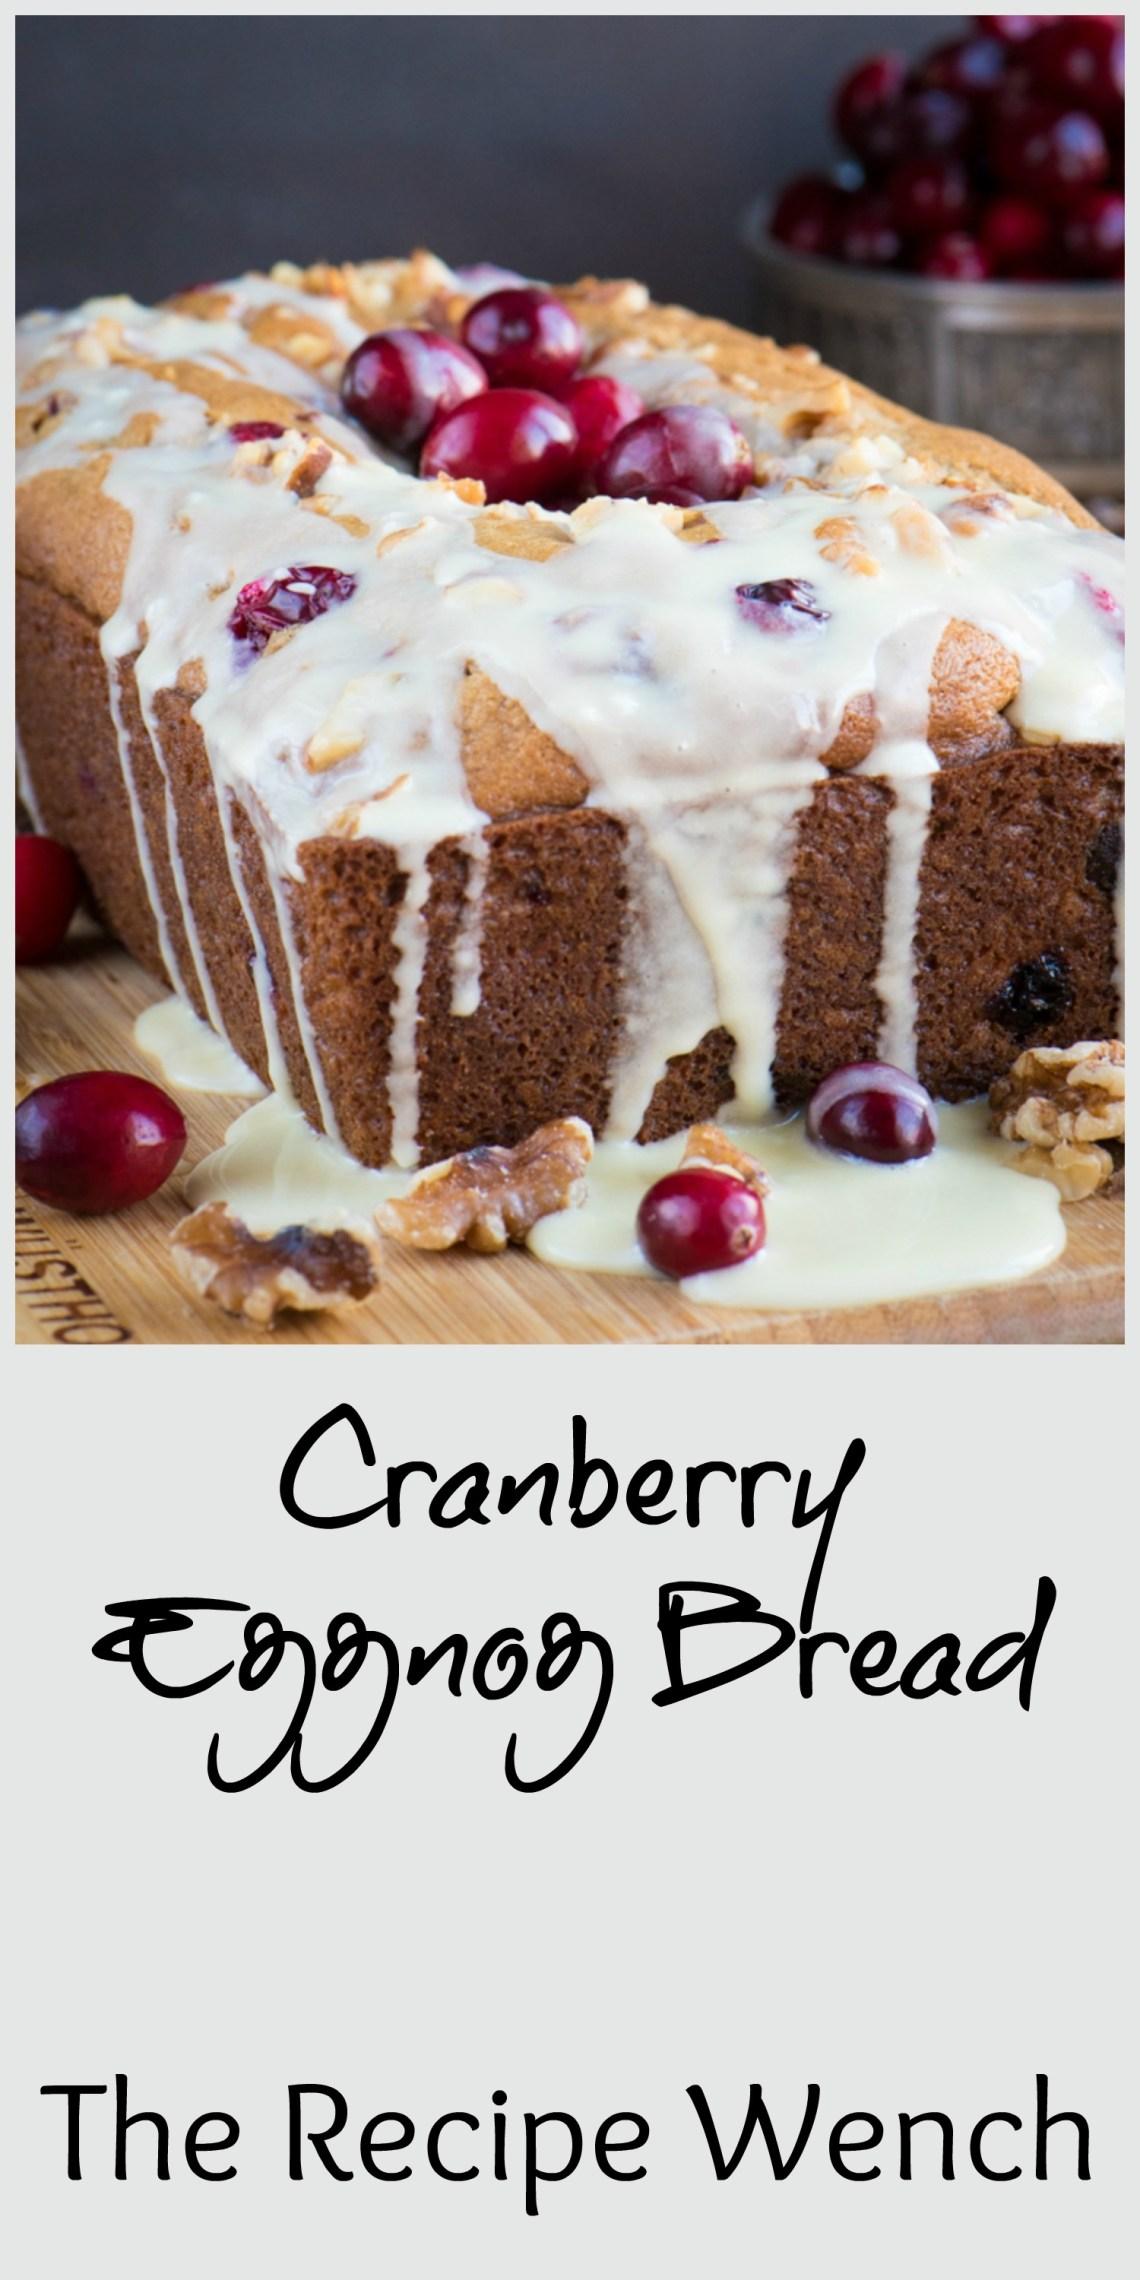 Cranberry eggnog bread with a heavenly eggnog glaze | The Recipe Wench